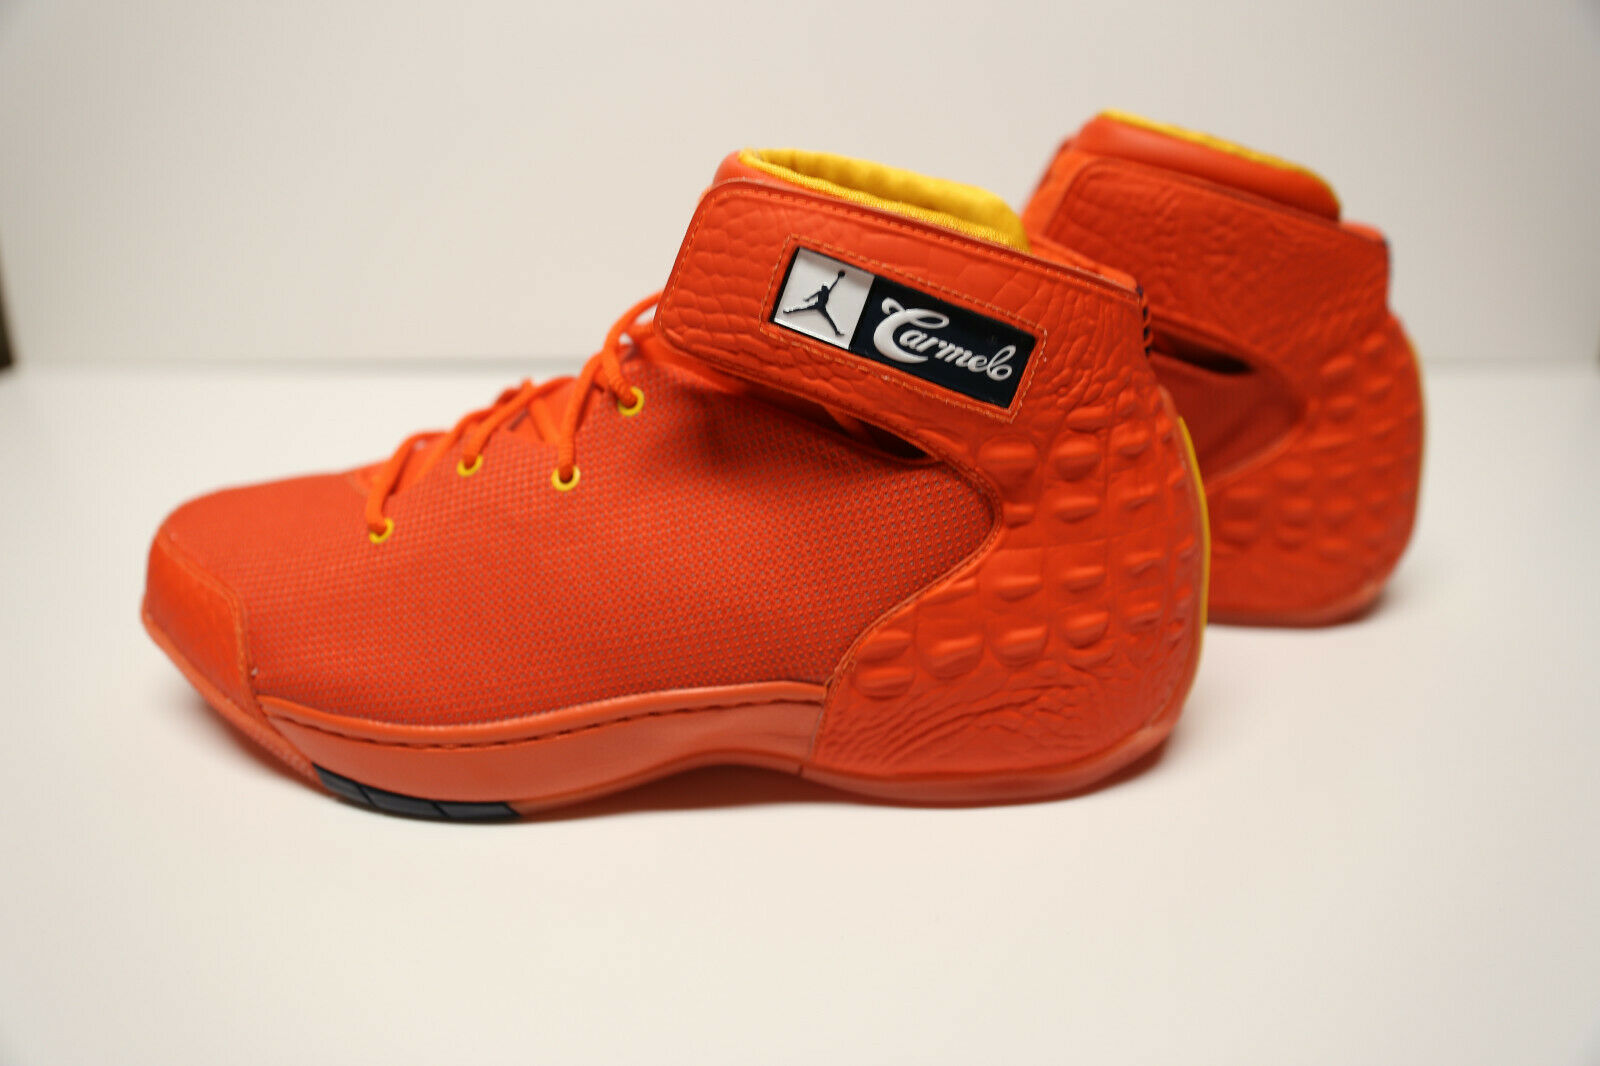 New NIKE Air Jordan Melo 1.5 SE Size 12 Basketball shoes AT5386 801